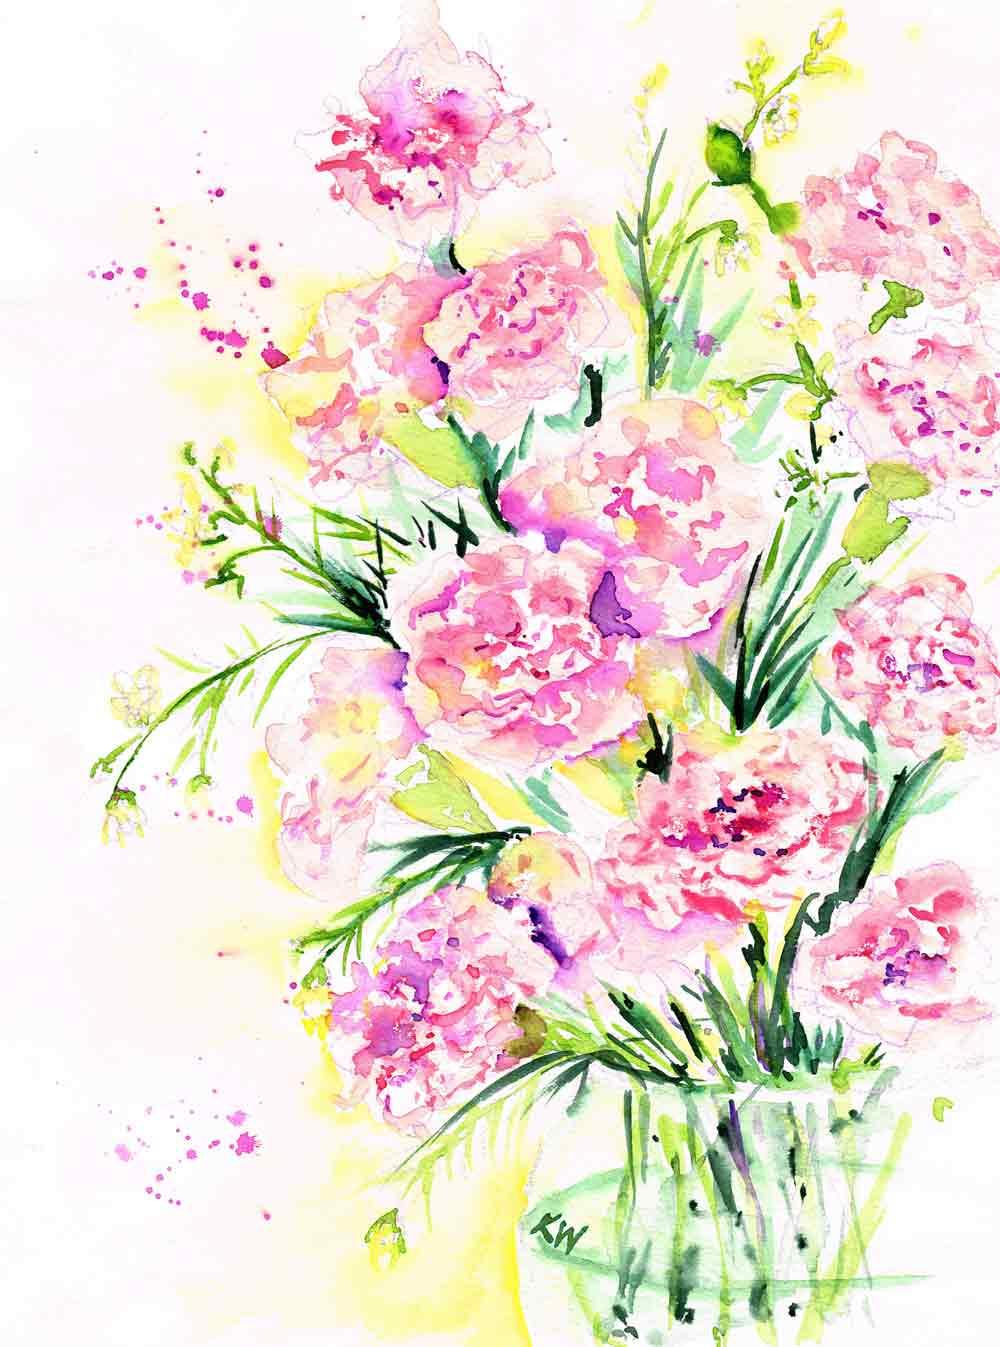 Fresh-flowers-scan-no-3-kw.jpg